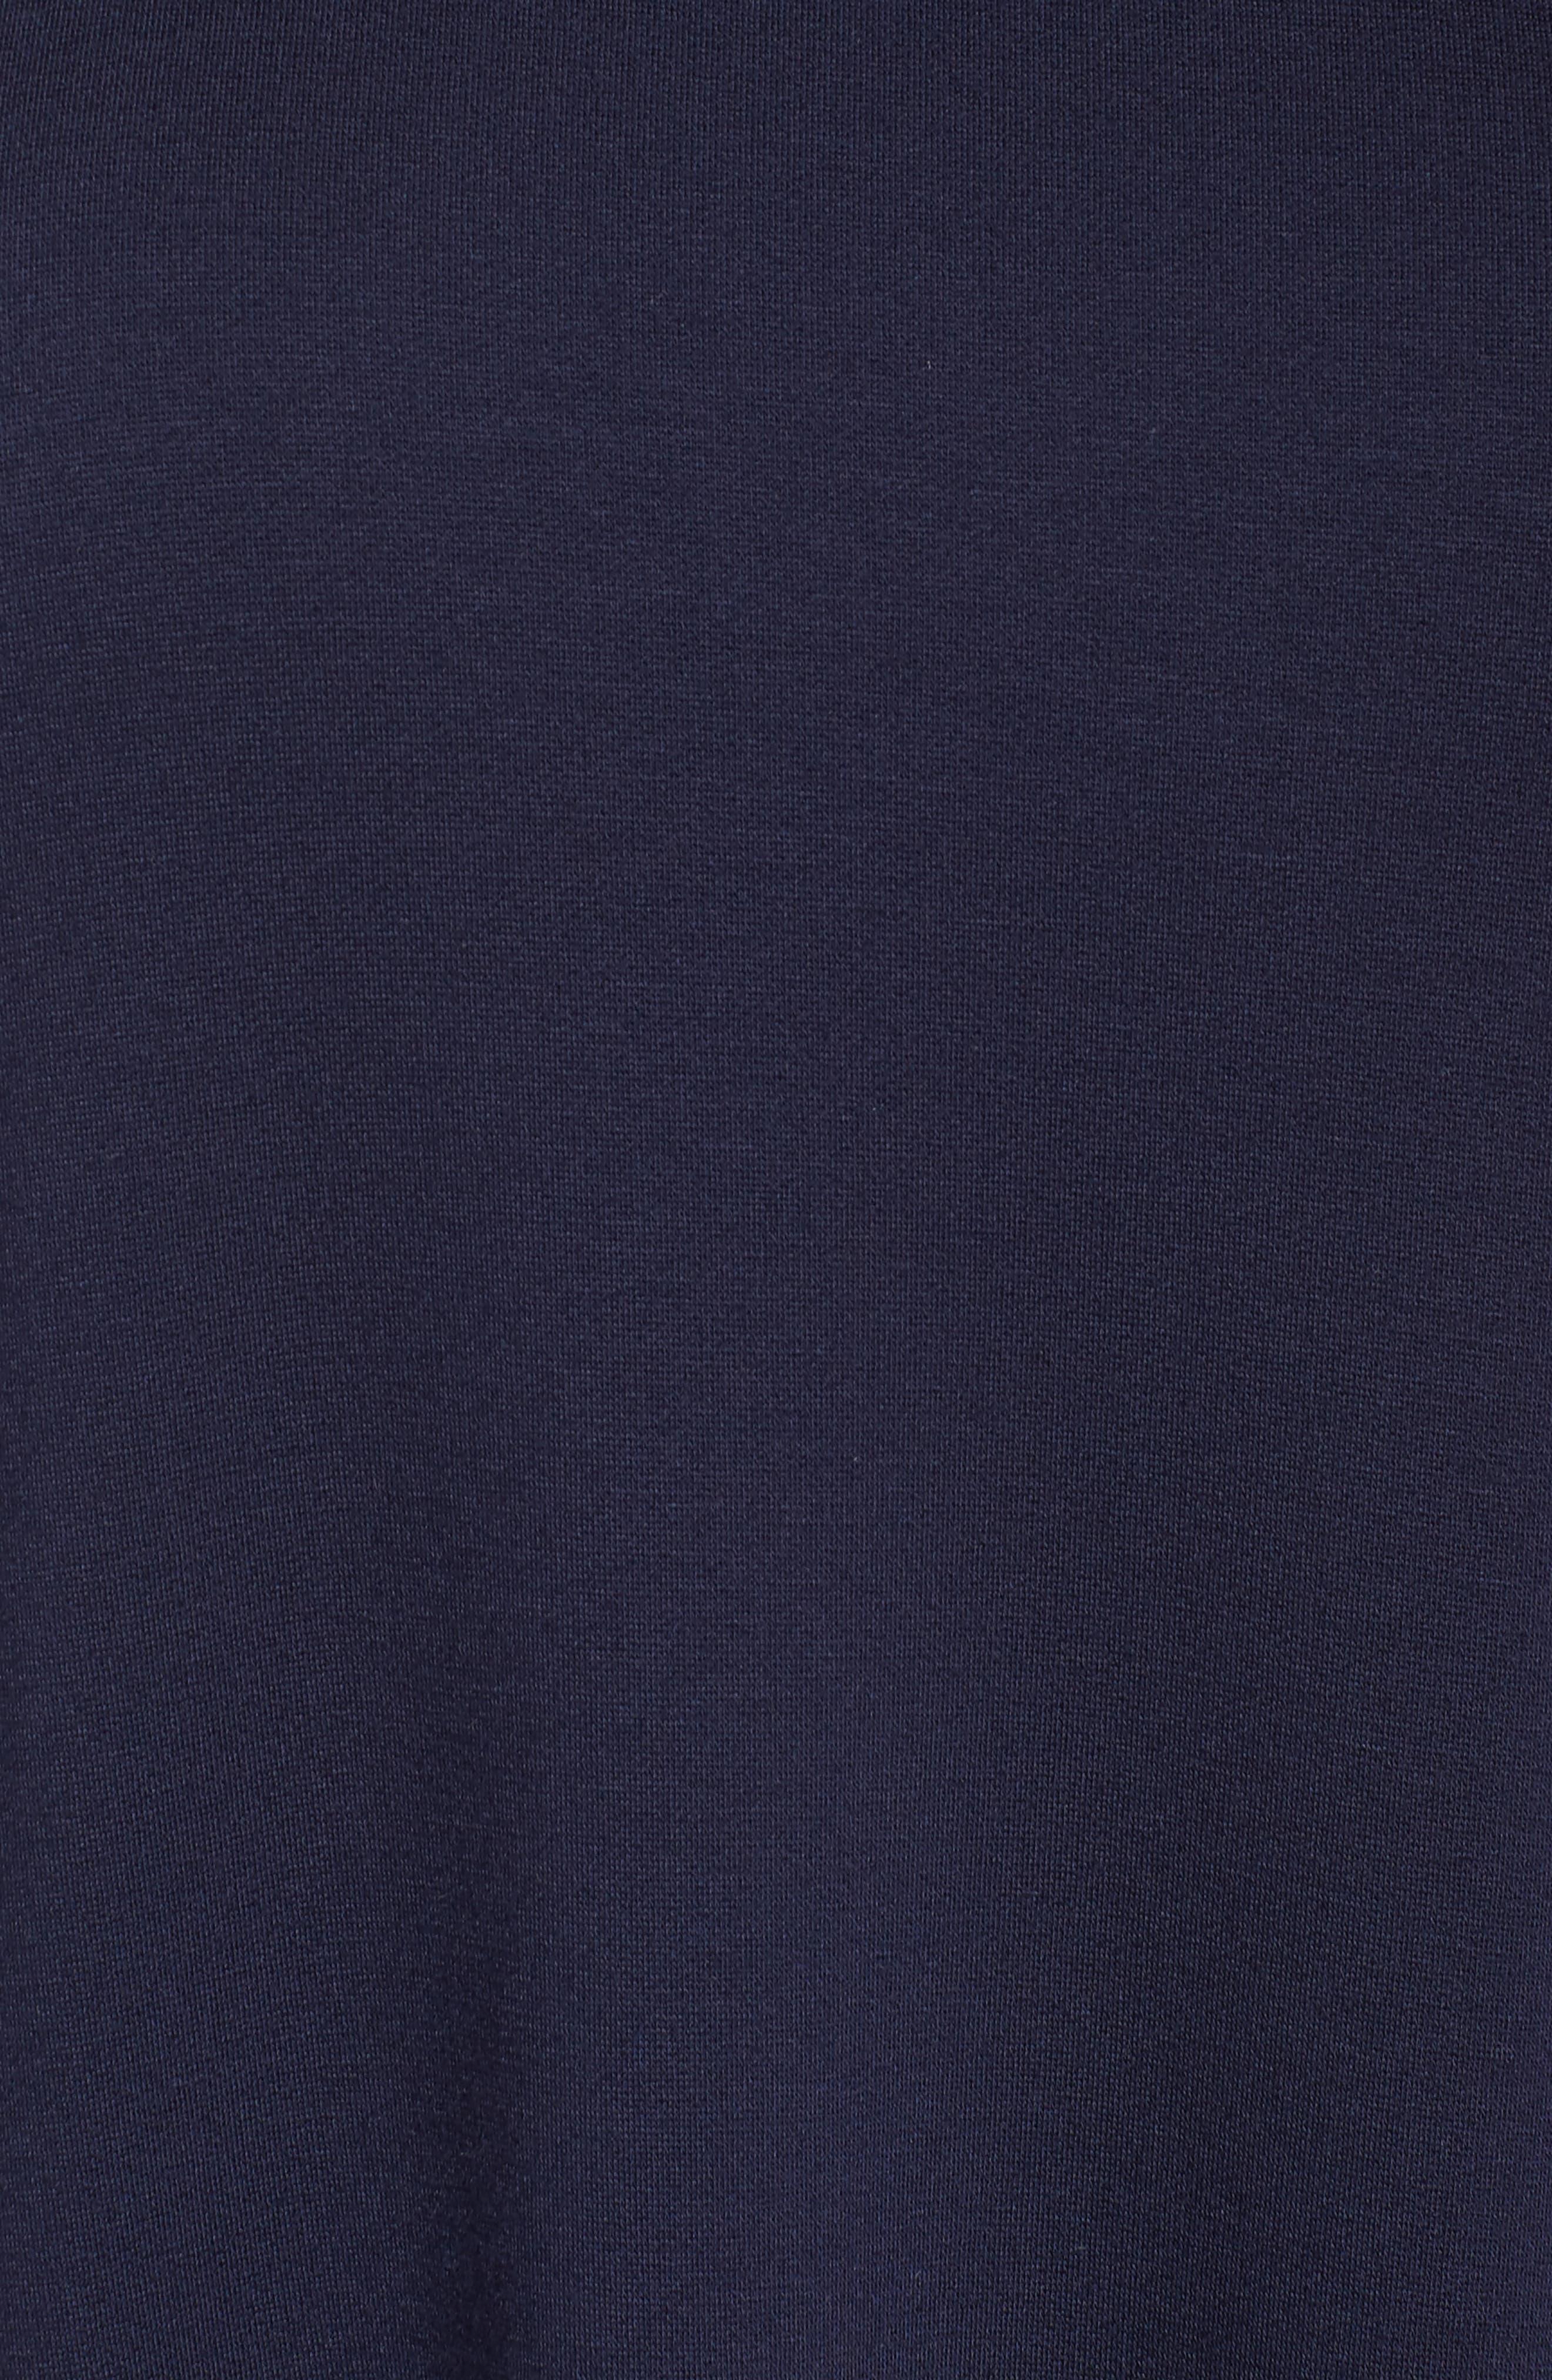 Stretch Tencel<sup>®</sup> Knit Jumper Dress,                             Alternate thumbnail 15, color,